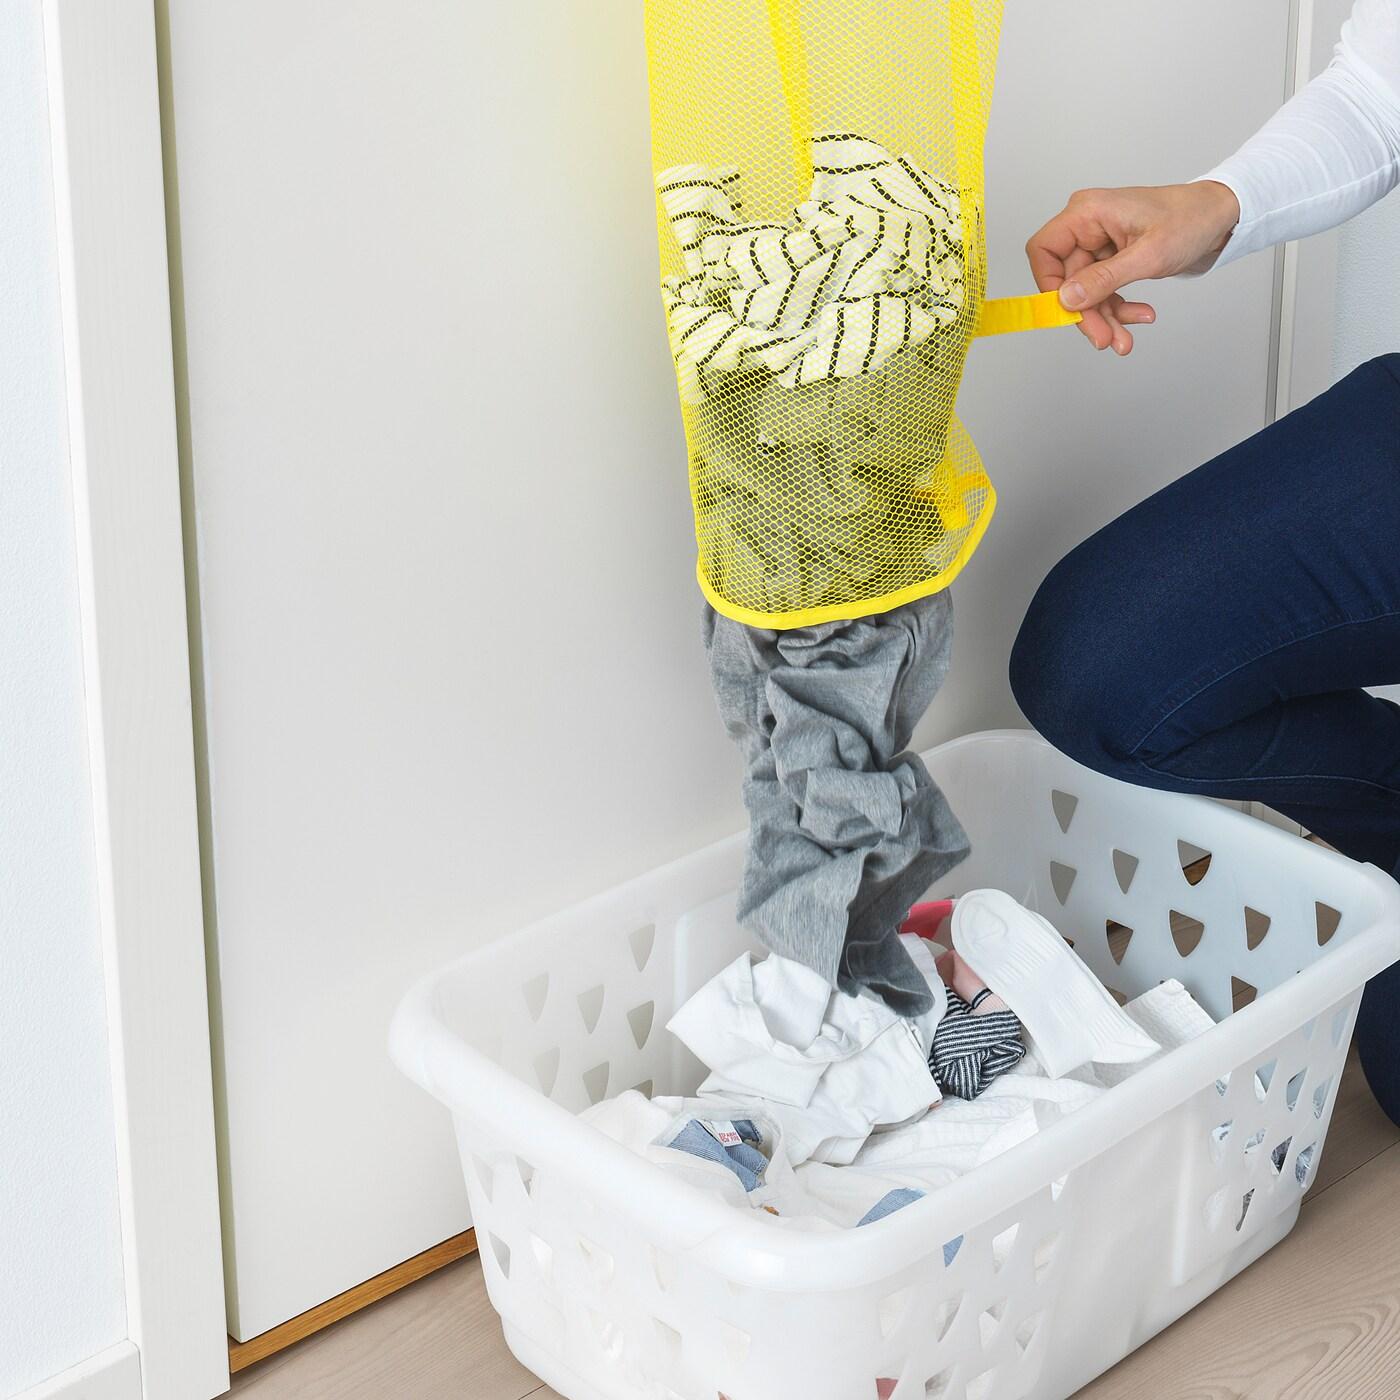 Корзина с мячом/мешок на дверь ЛУСТИГТ артикуль № 503.650.59 в наличии. Онлайн каталог IKEA Минск. Недорогая доставка и монтаж.